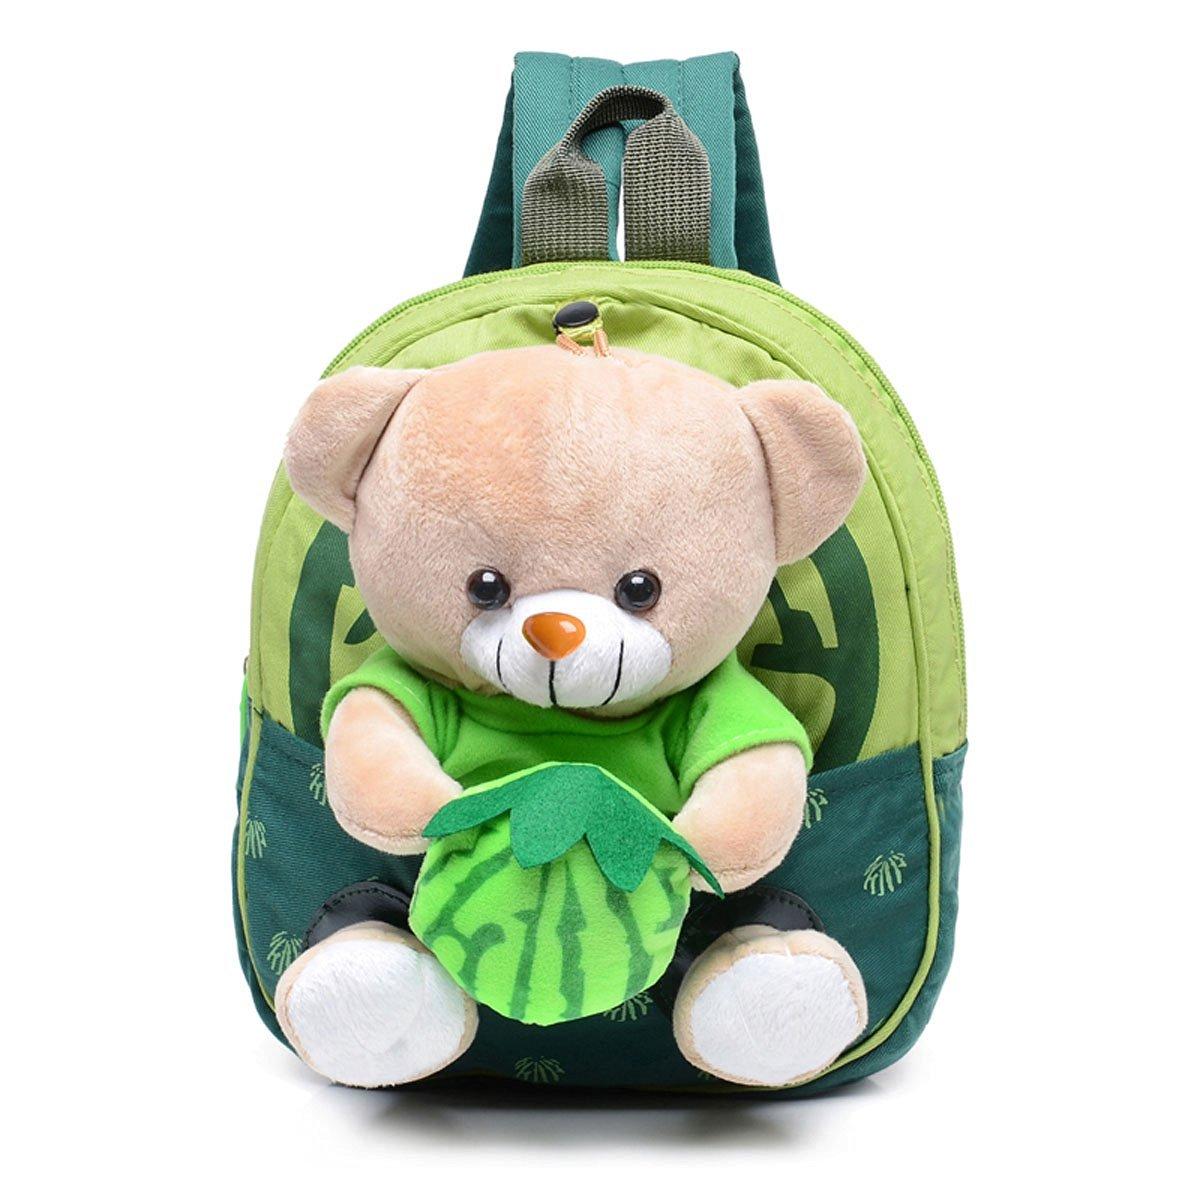 Sunny World Adorable Bear Fruit Cartoon Schoolbag Nursery Small Backpack Rucksack Bag for Kindergarten Baby Kids Child (1-4yrs) (Green)